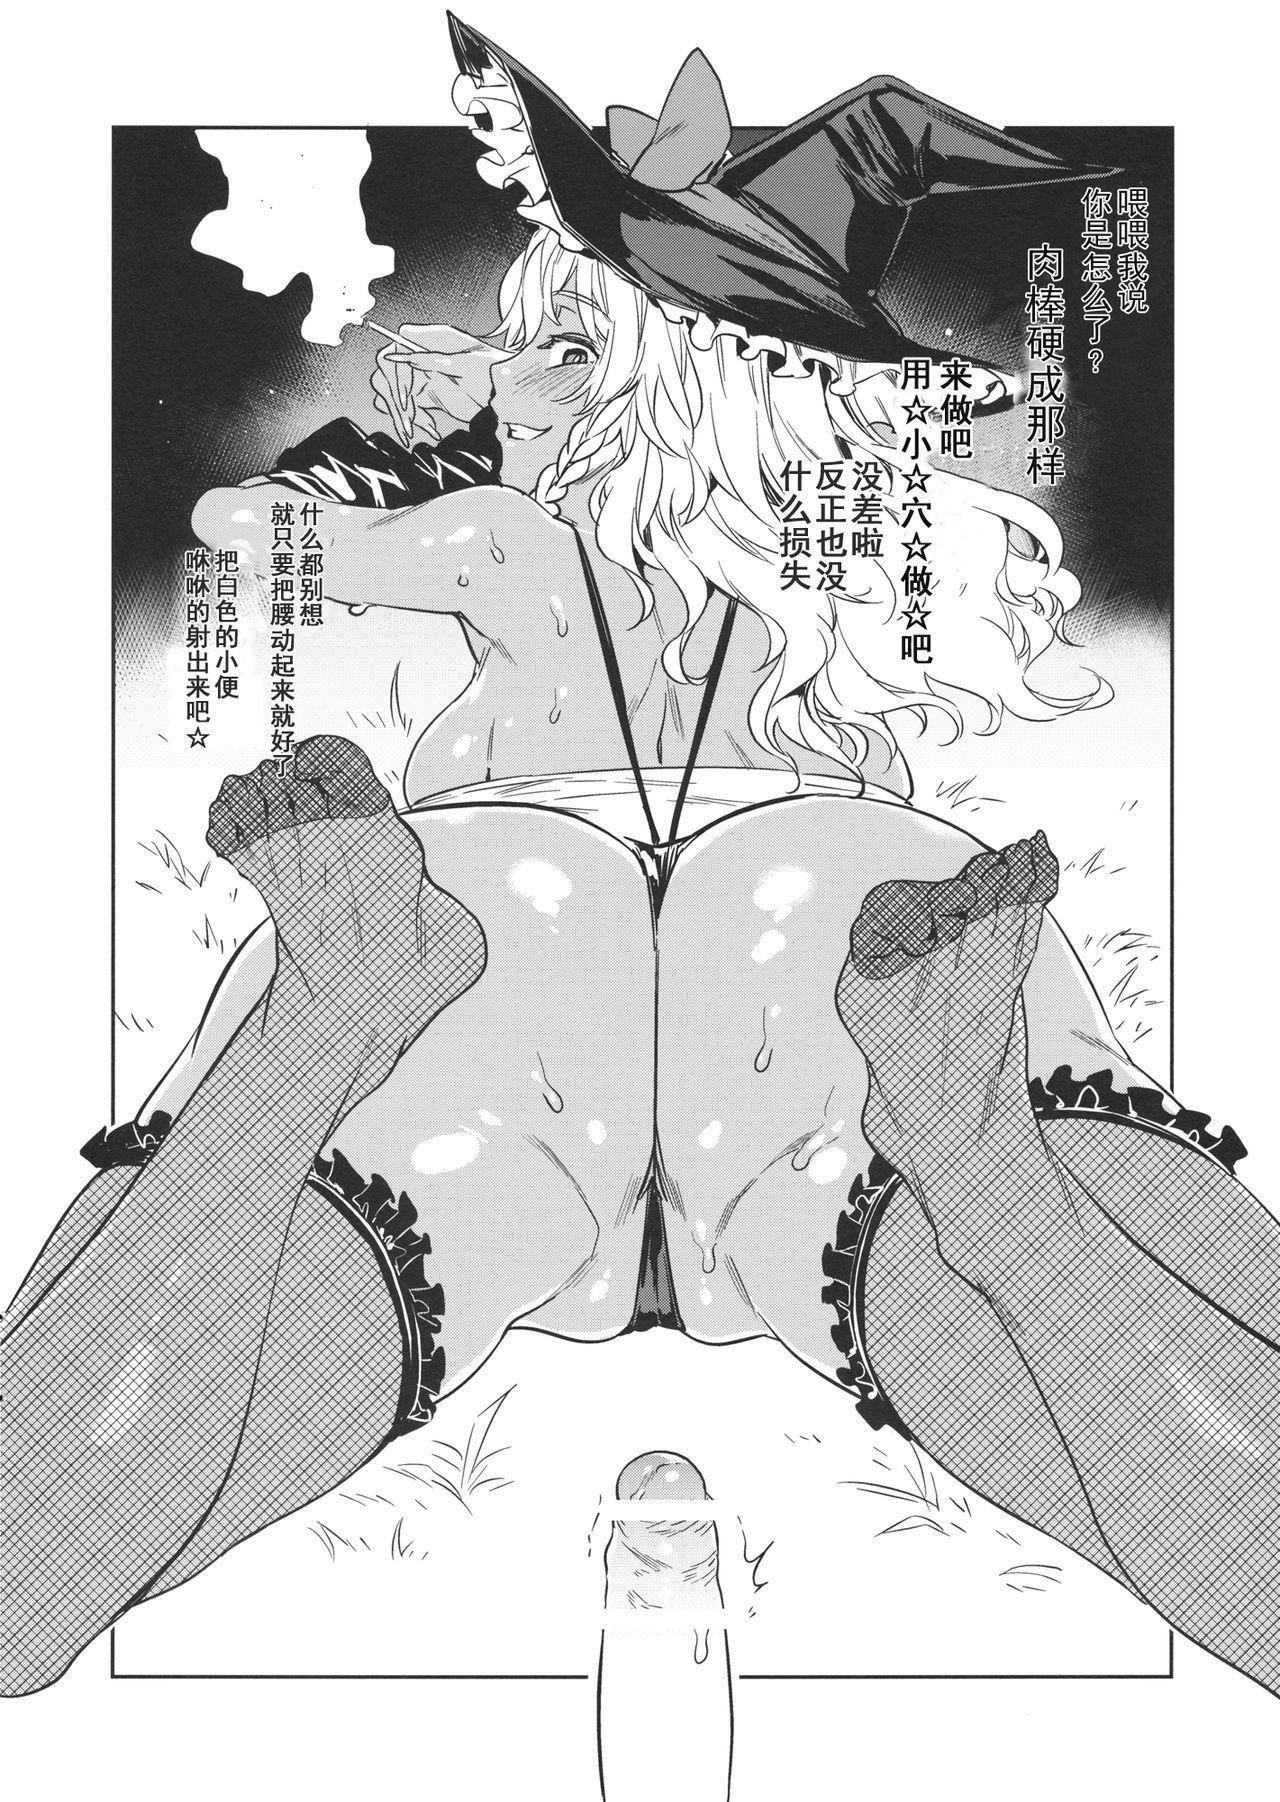 Torokeru Hyousei Kuro Gal Summer Append 2